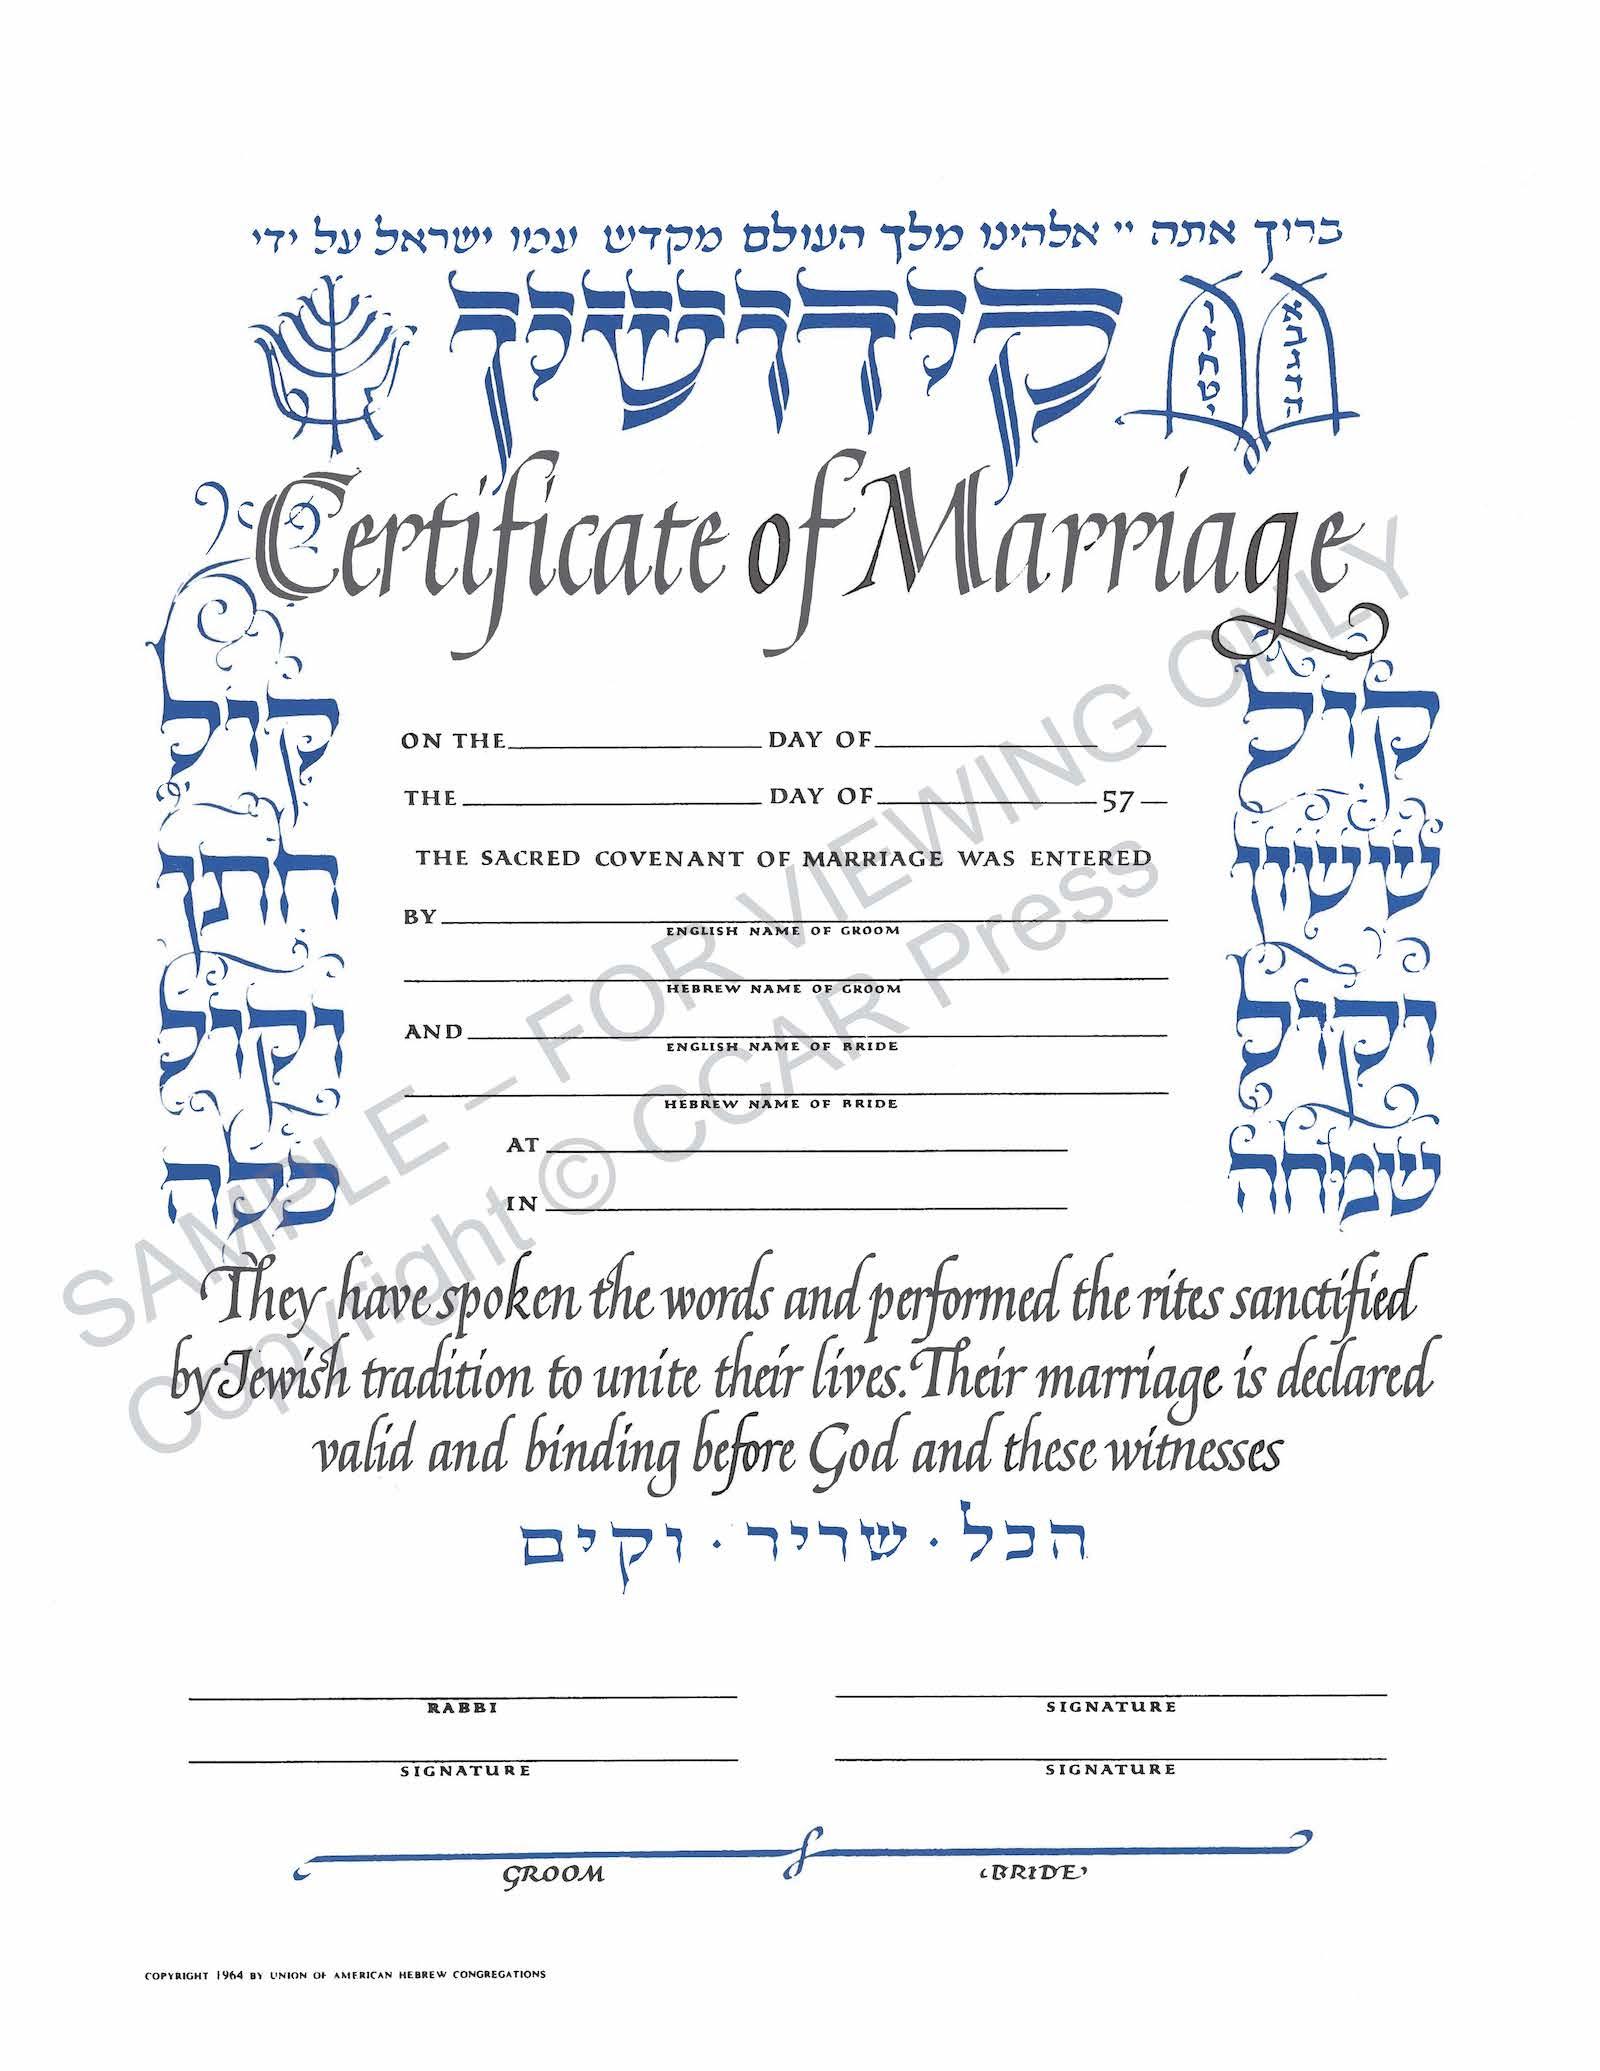 Marriage, Gender Neutral - Certificate